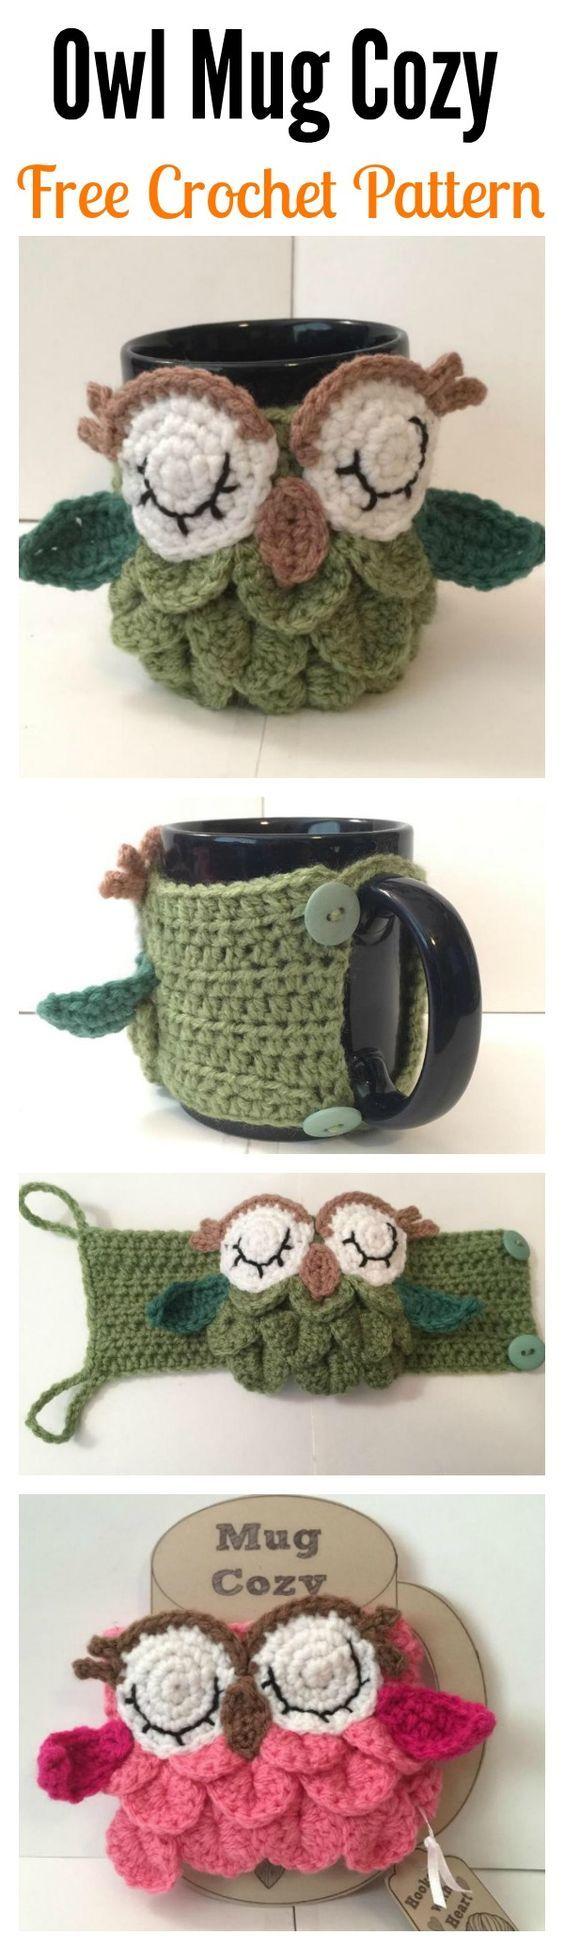 Crochet Owl Mug Cozy Free Patterns | Häkeln, Tassenwärmer und Eule